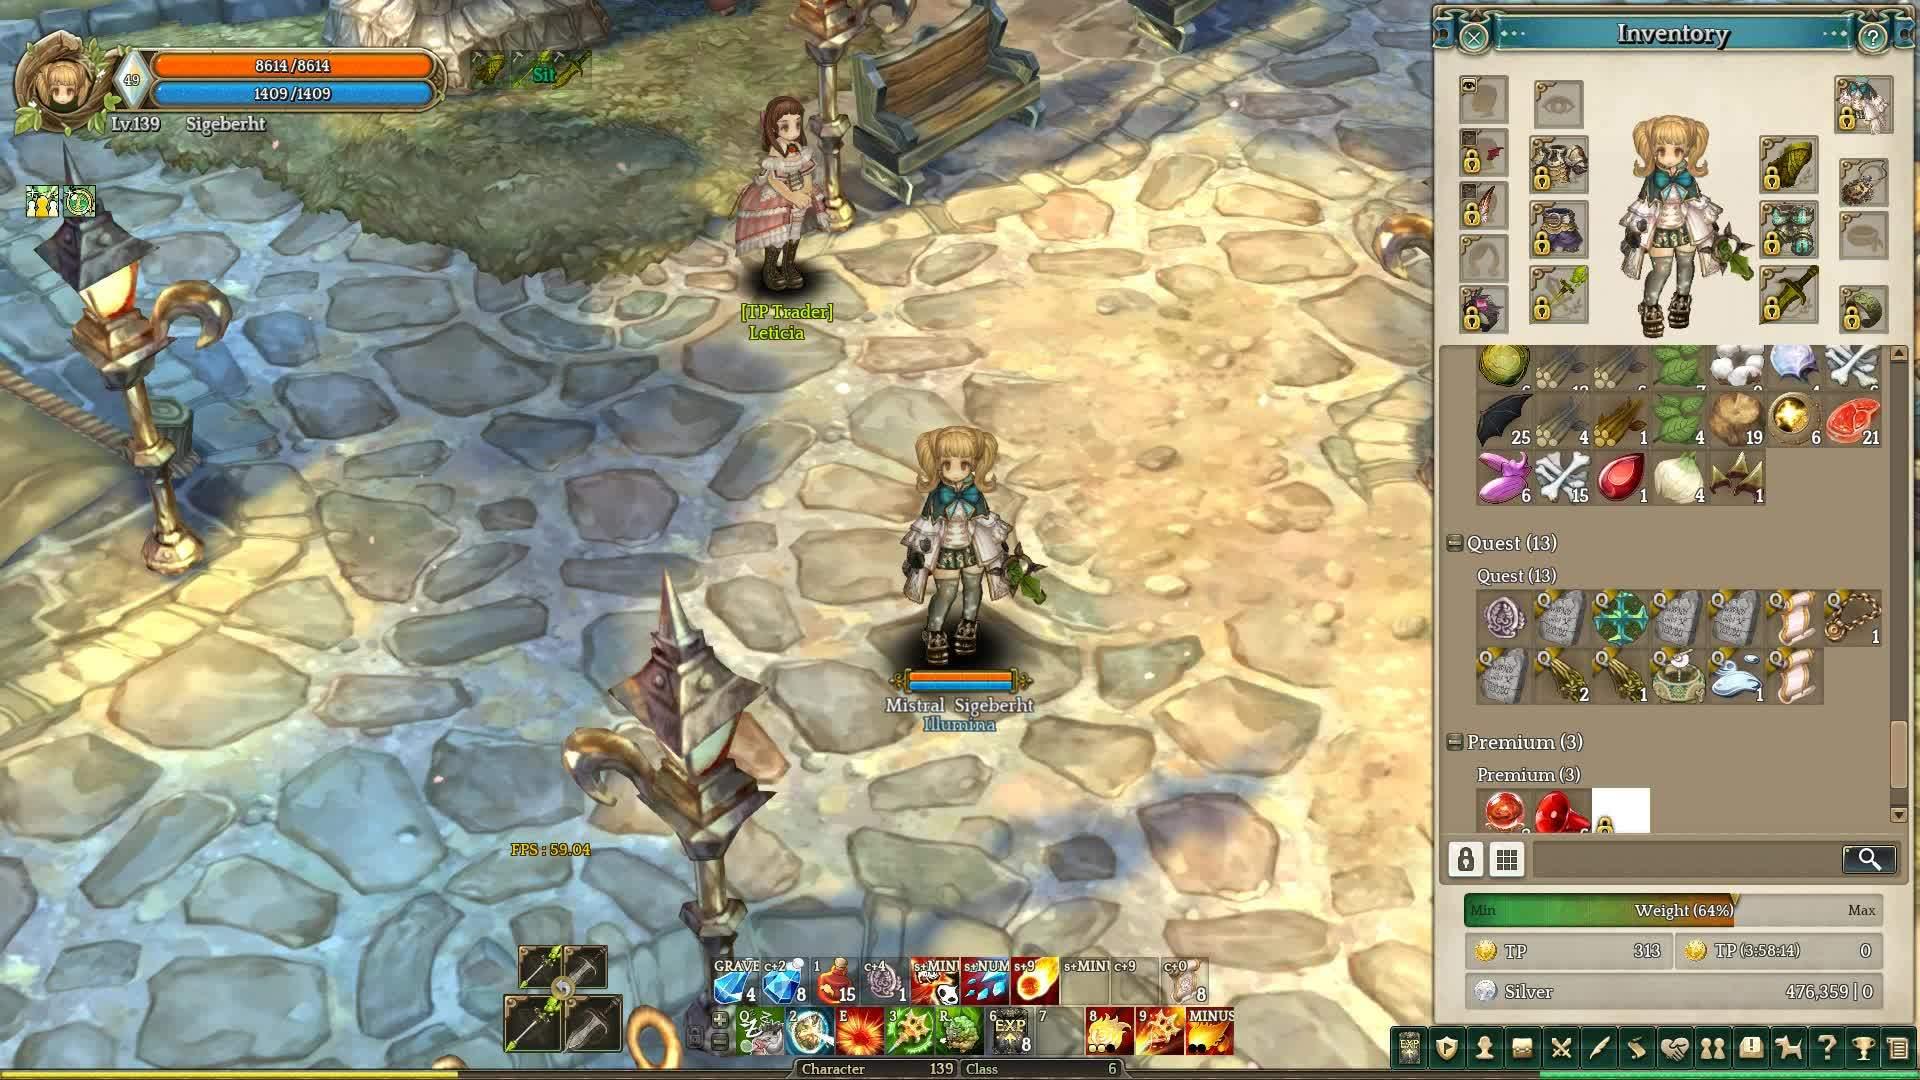 treeofsavior, Wizard C3 idle/running animation GIFs